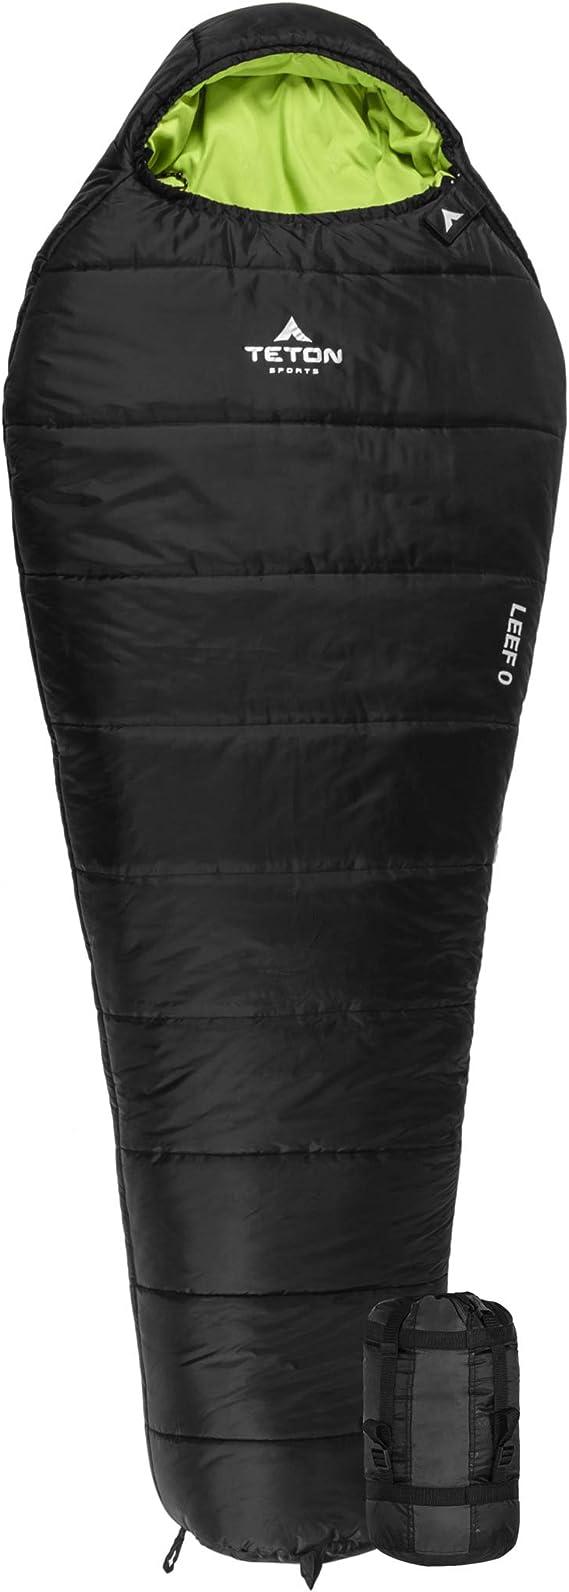 TETON Sports LEEF Lightweight Mummy Sleeping Bag; Great for Hiking